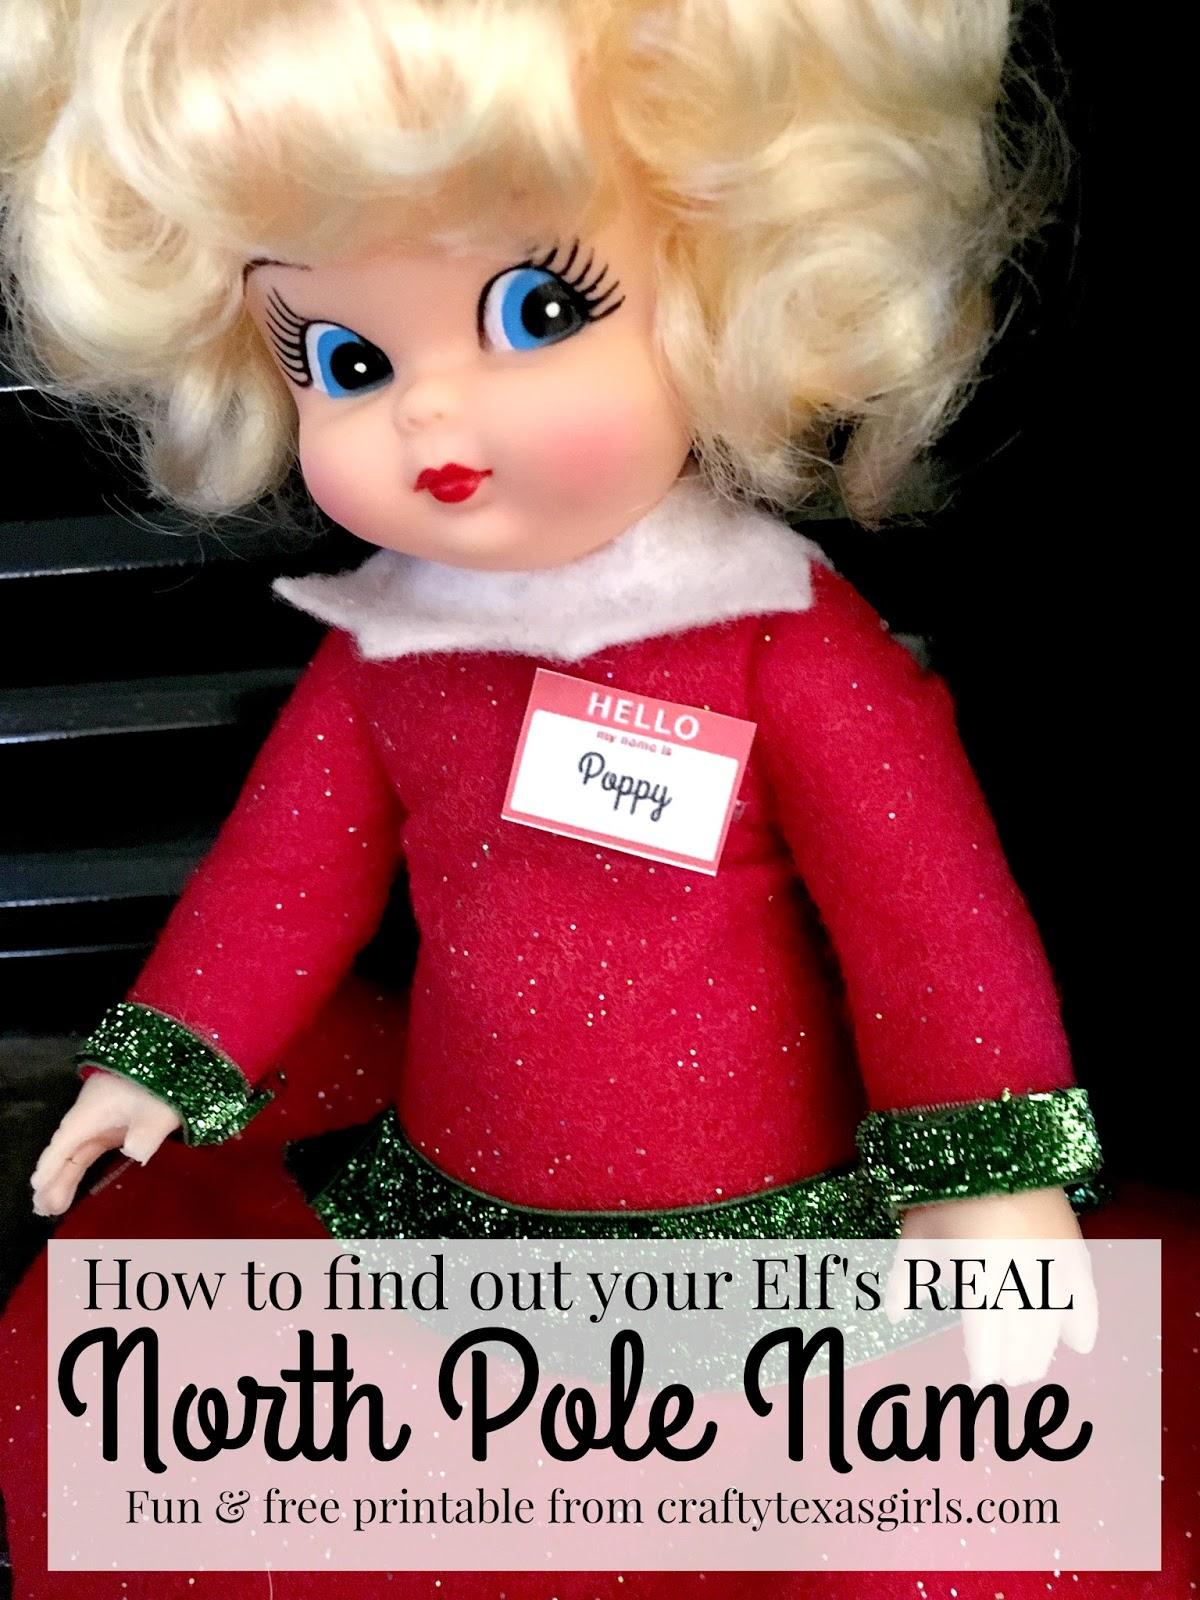 Crafty Texas Girls Elf on the Shelf Name Tags Free Printable